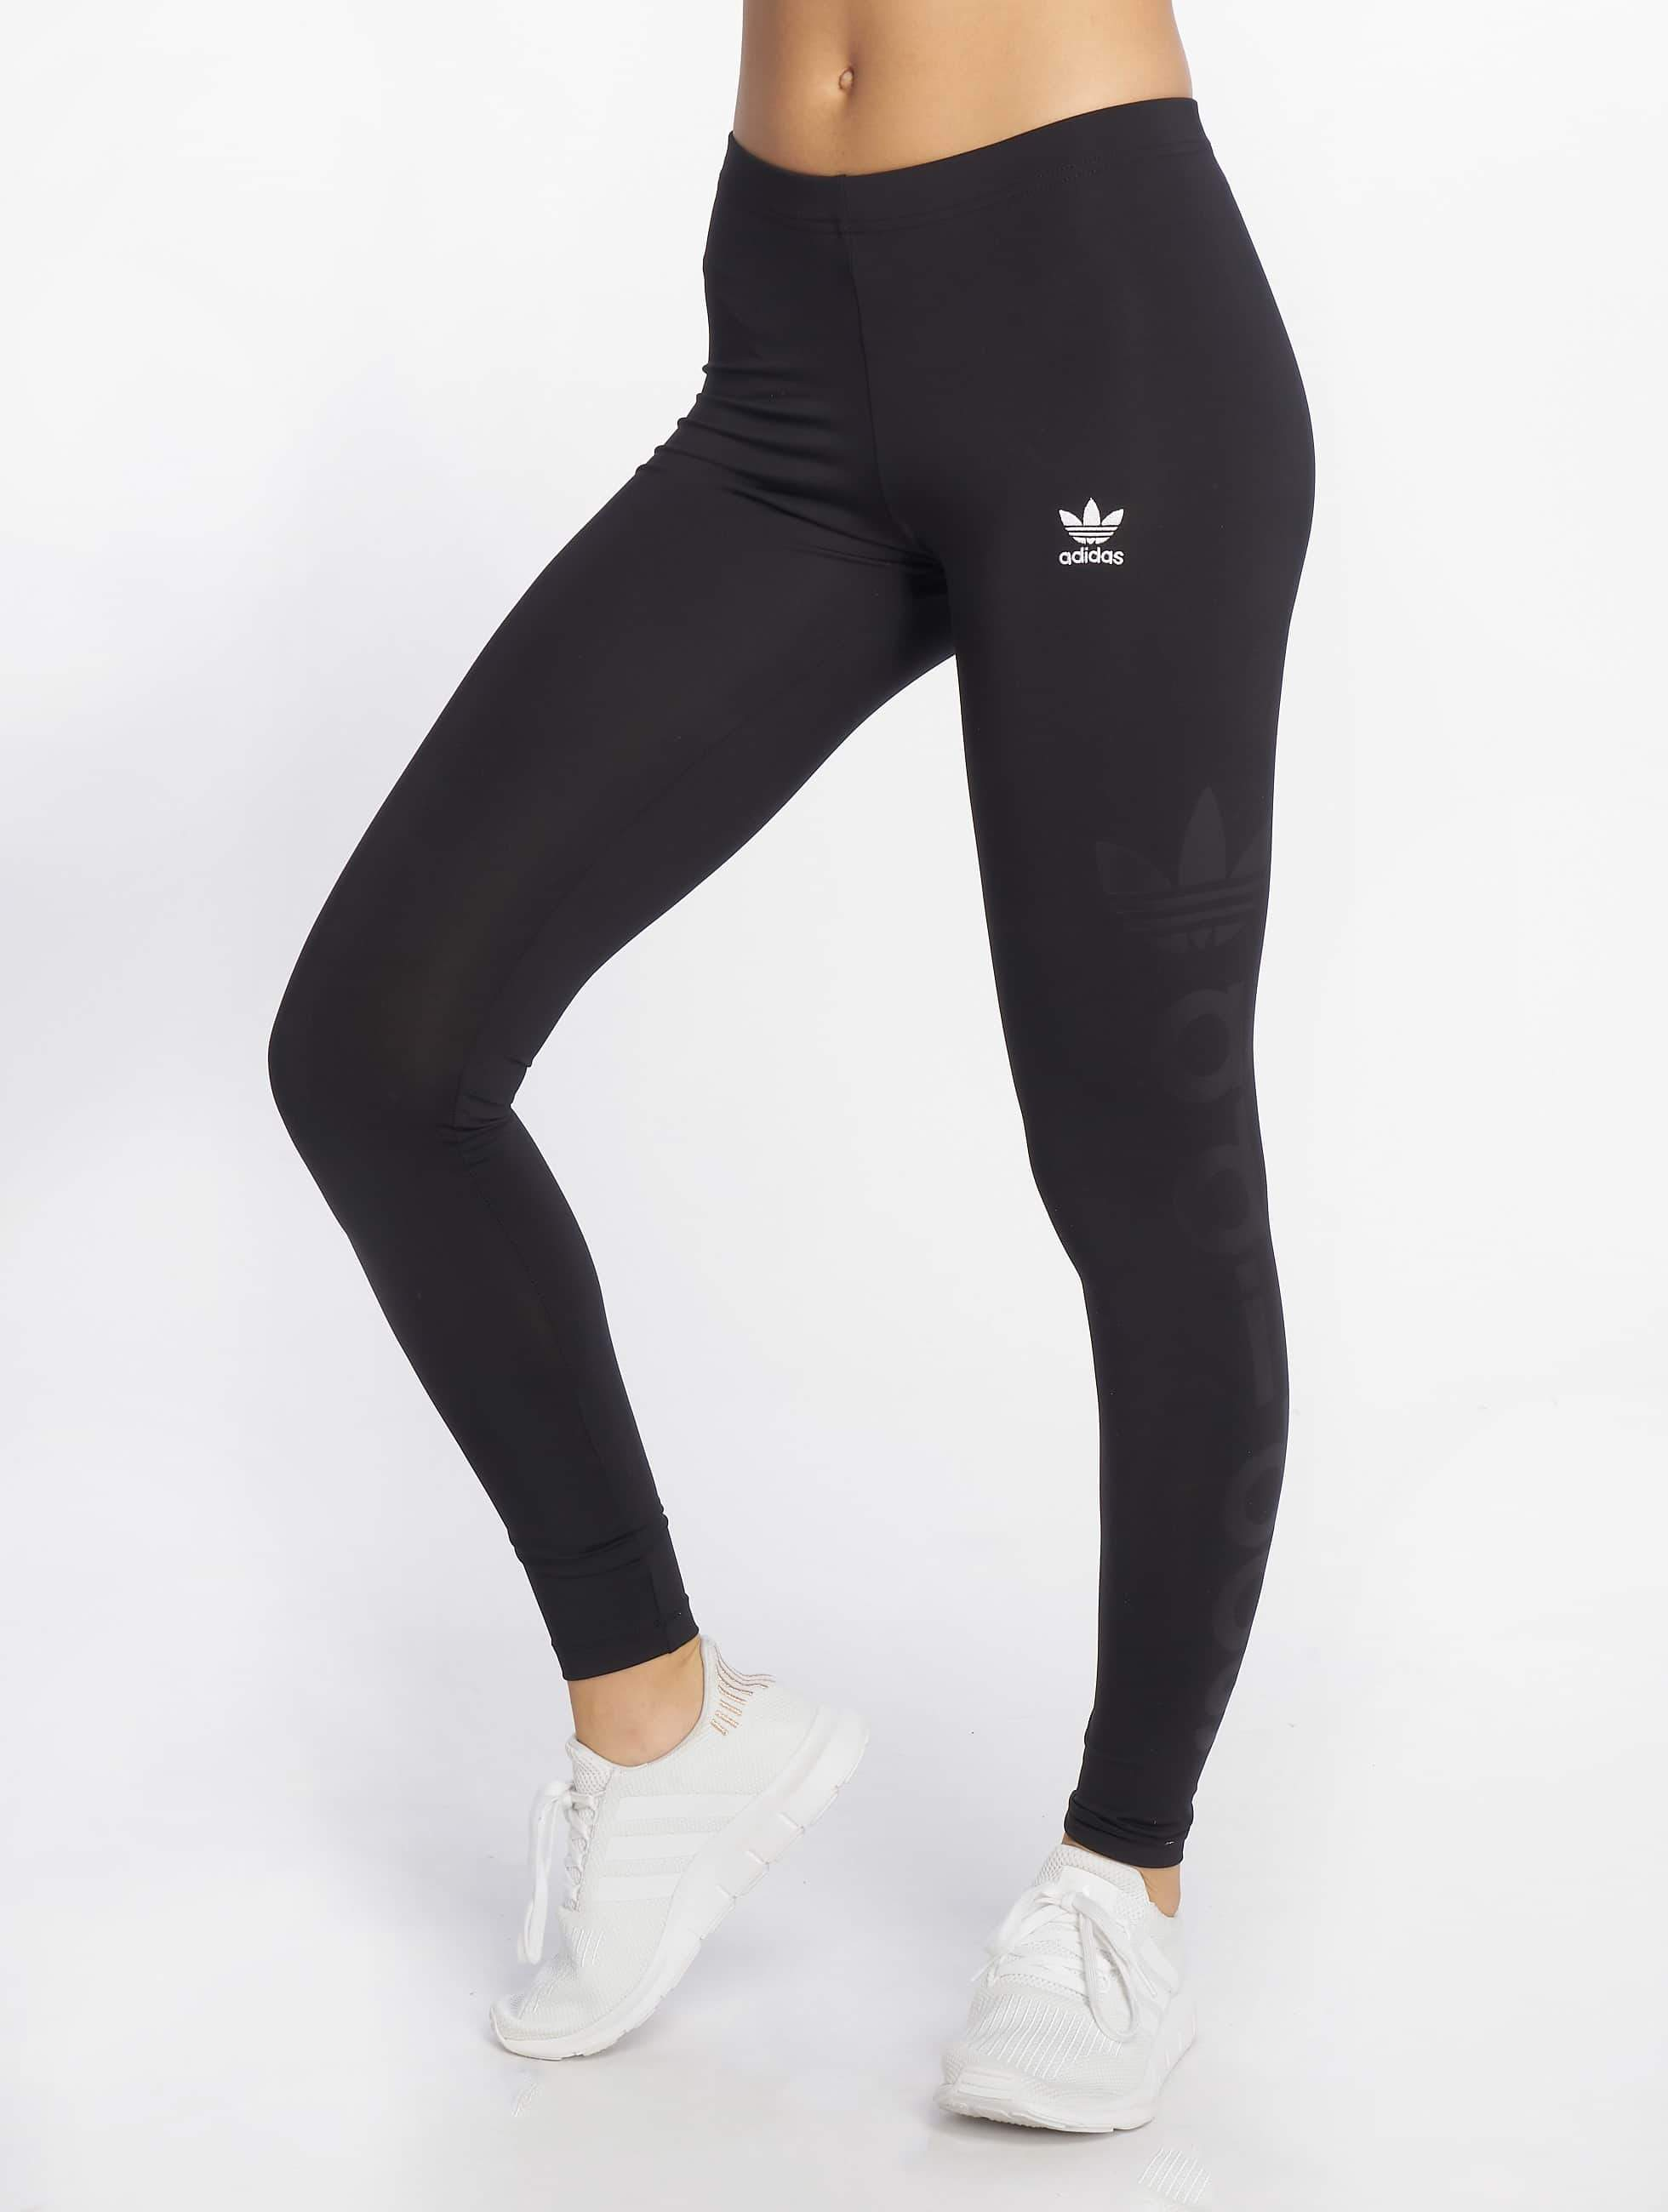 84b898d6cbb adidas originals broek / Legging Tights in zwart 499504